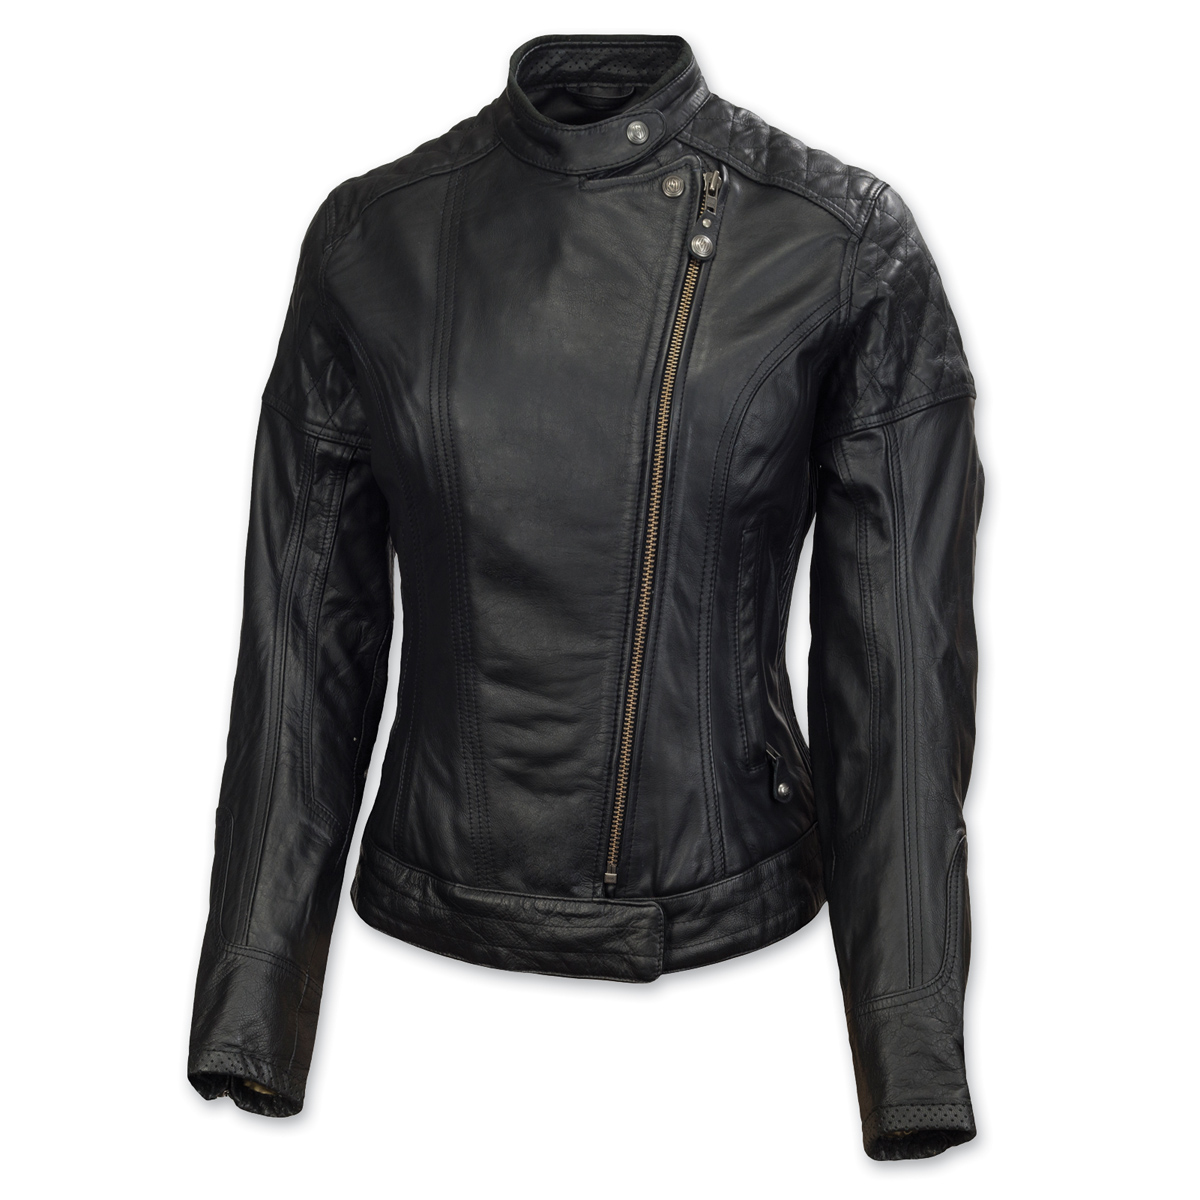 Roland Sands Design Riot Ladies Black Leather Jacket